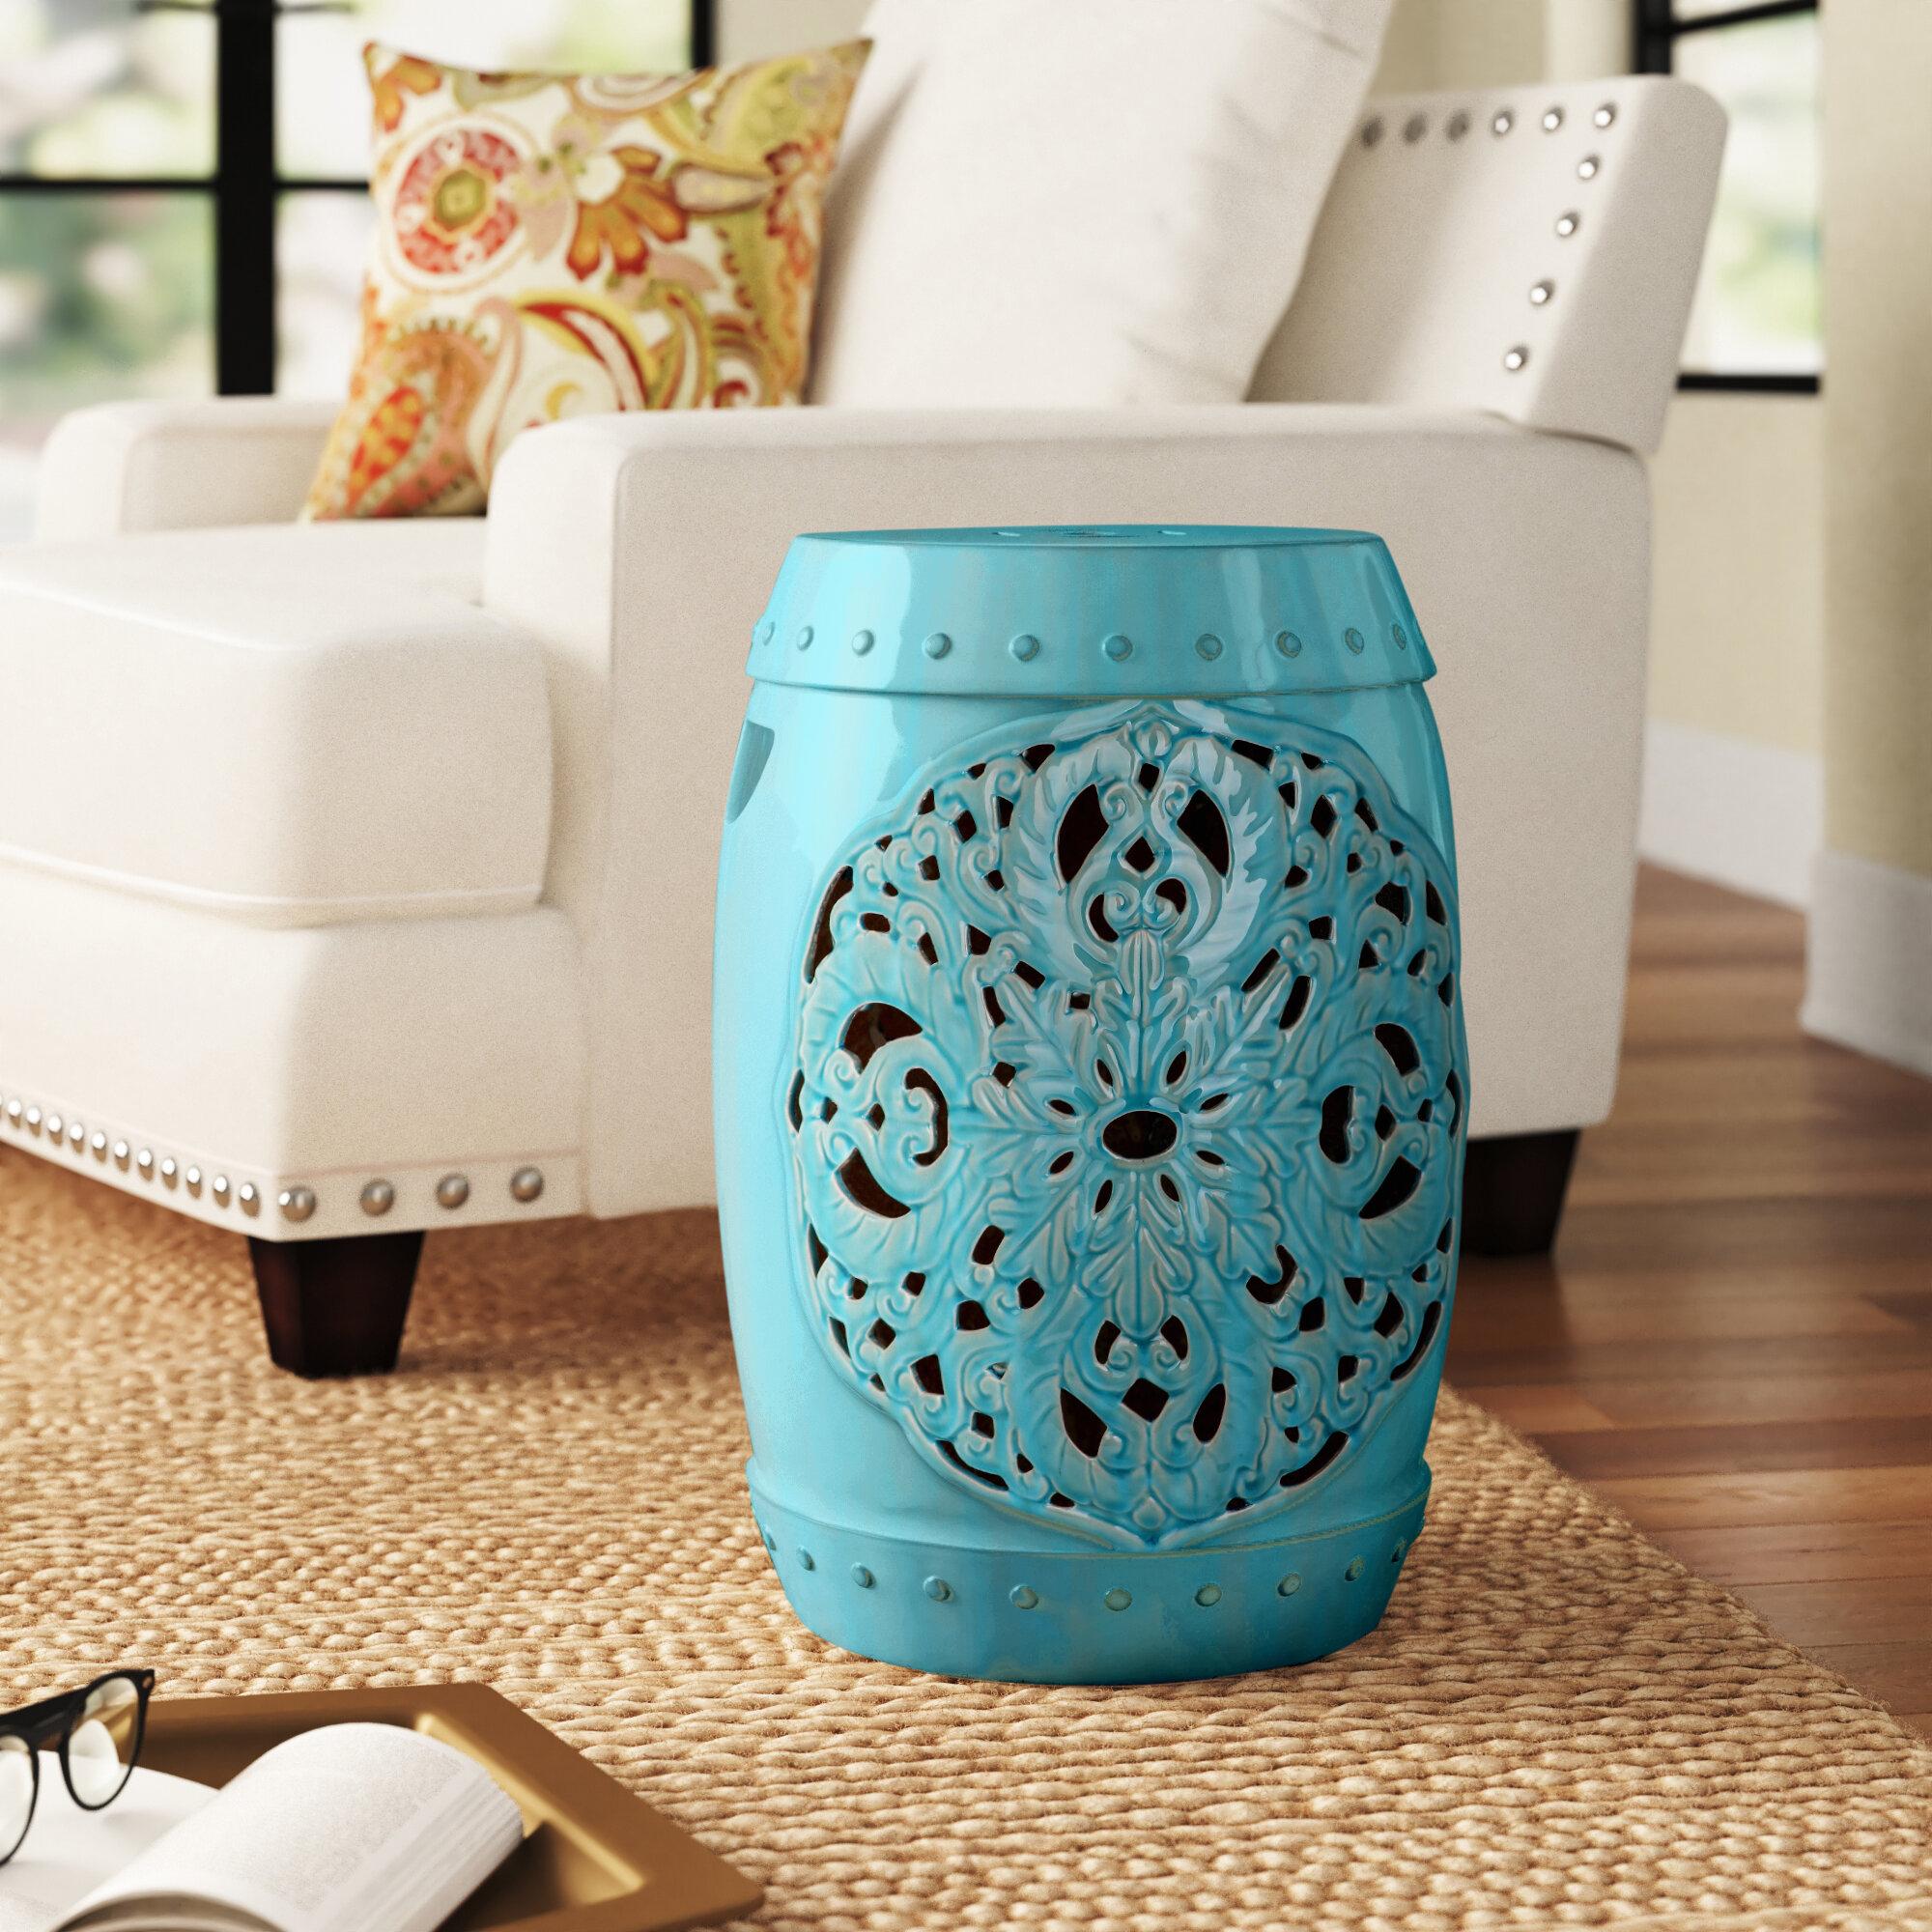 Nagle Ceramic Garden Stool With Regard To Tillia Ceramic Garden Stools (View 22 of 25)